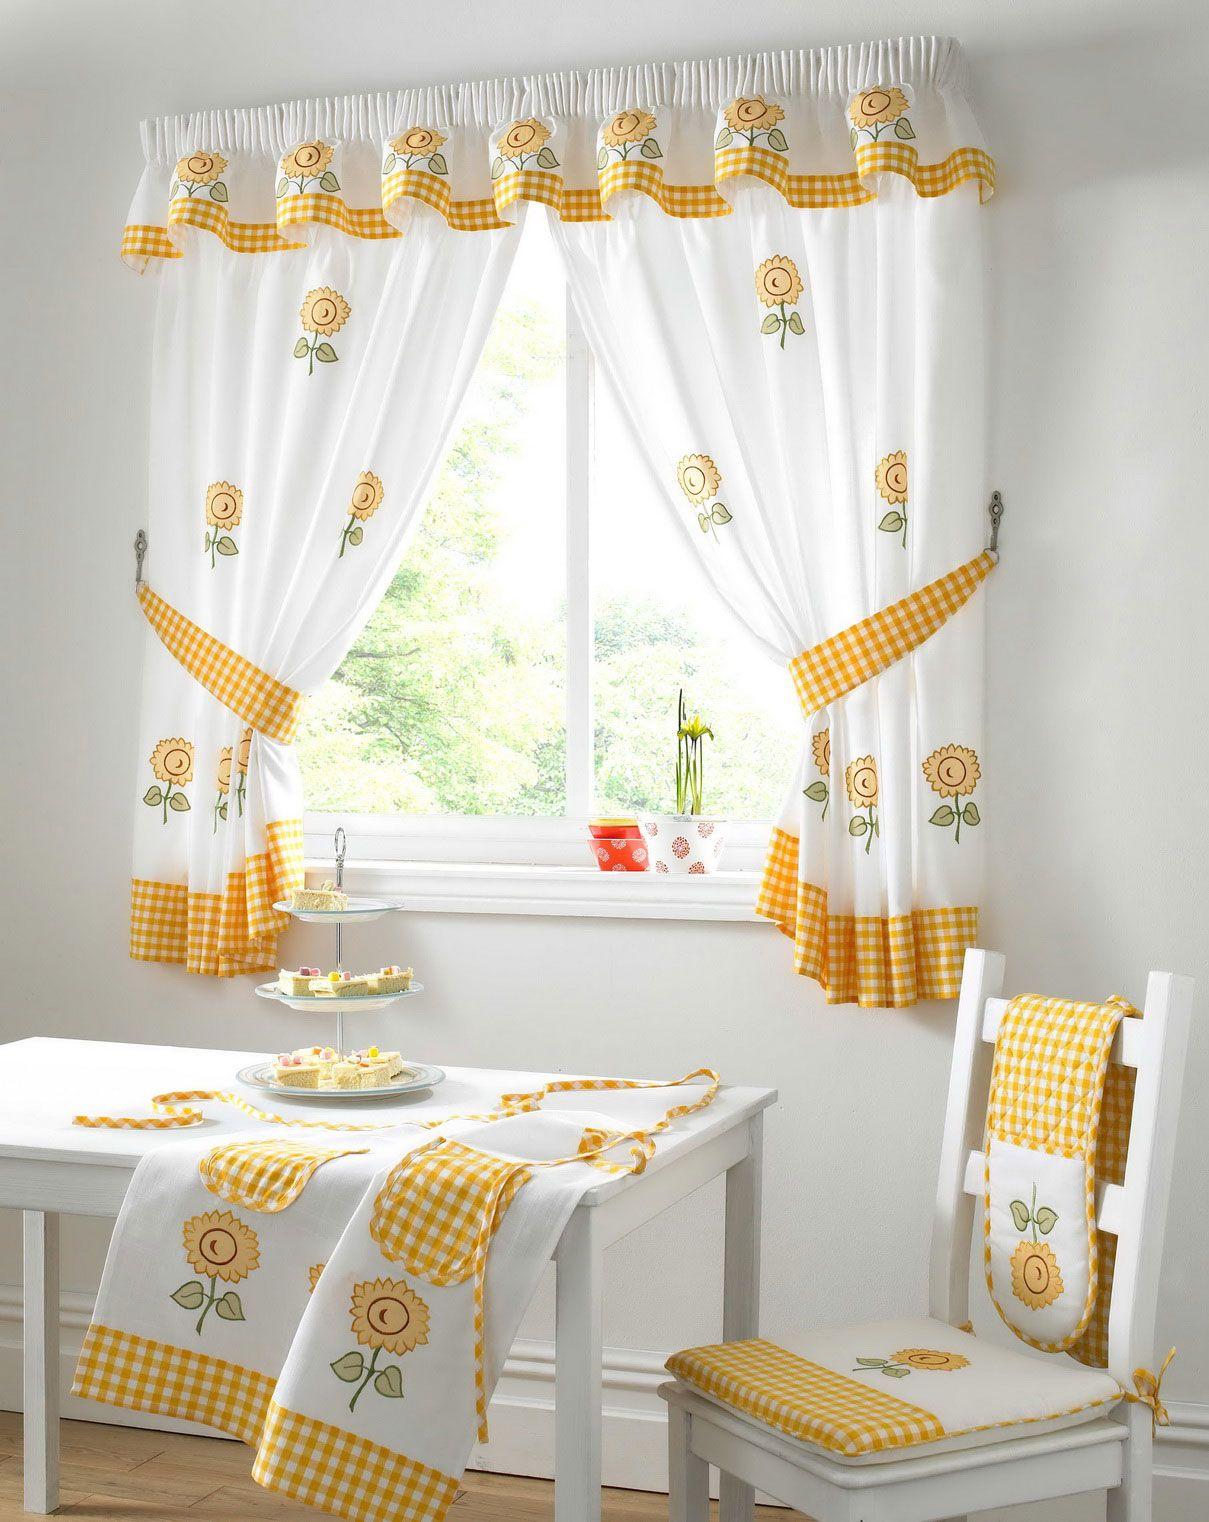 Home Design and Interior Design Gallery of Sunflower Curtain Ideas ...